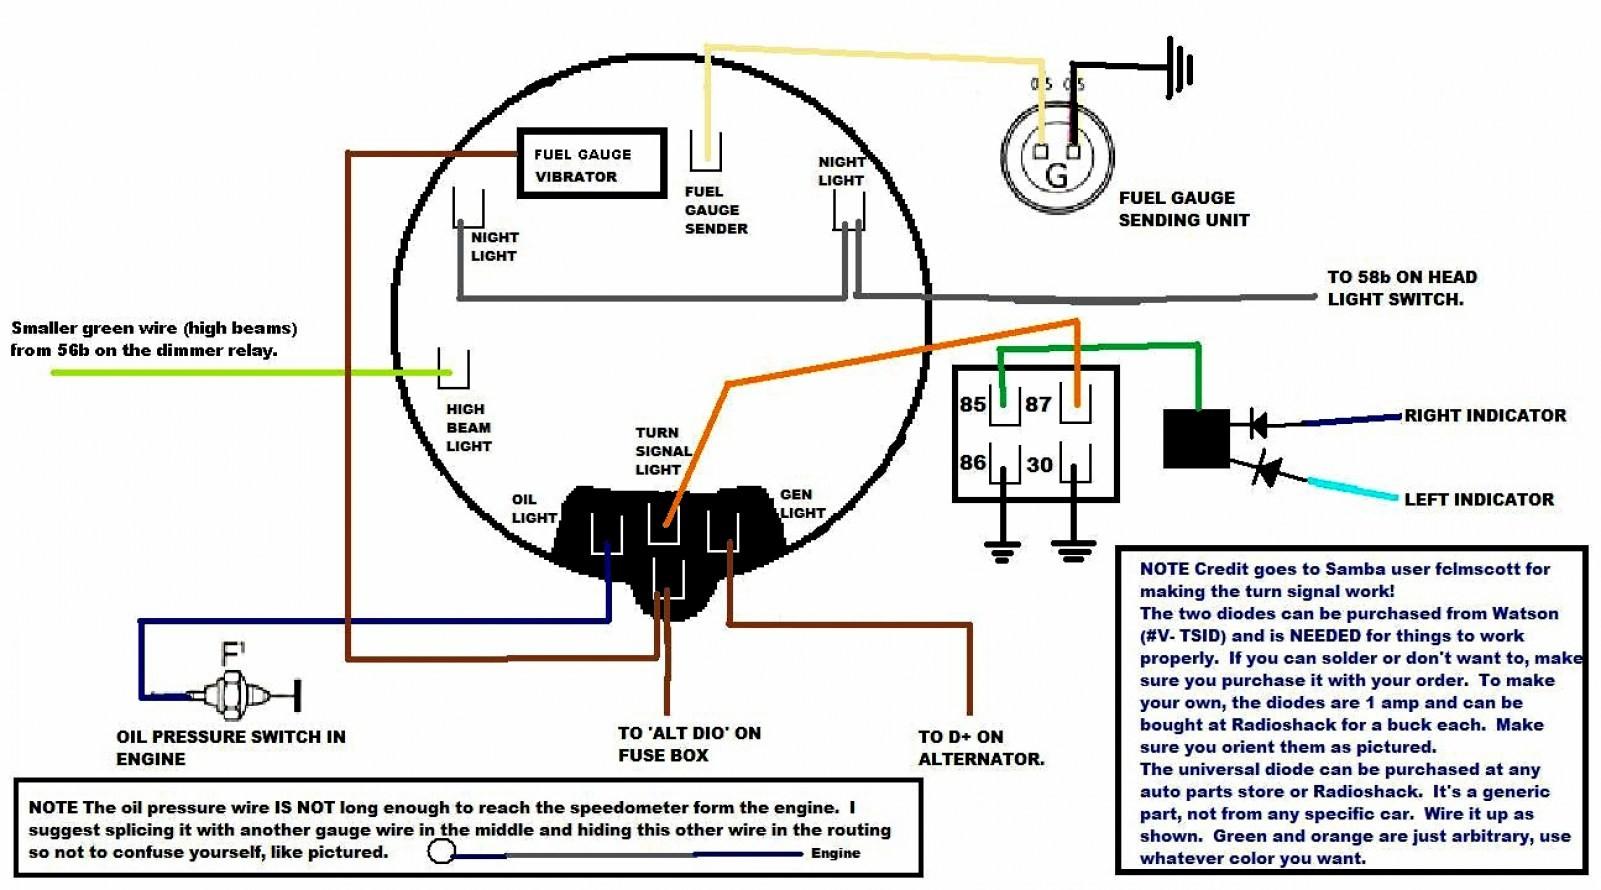 vdo gauges wiring diagrams fuel gauge diagram and schematics